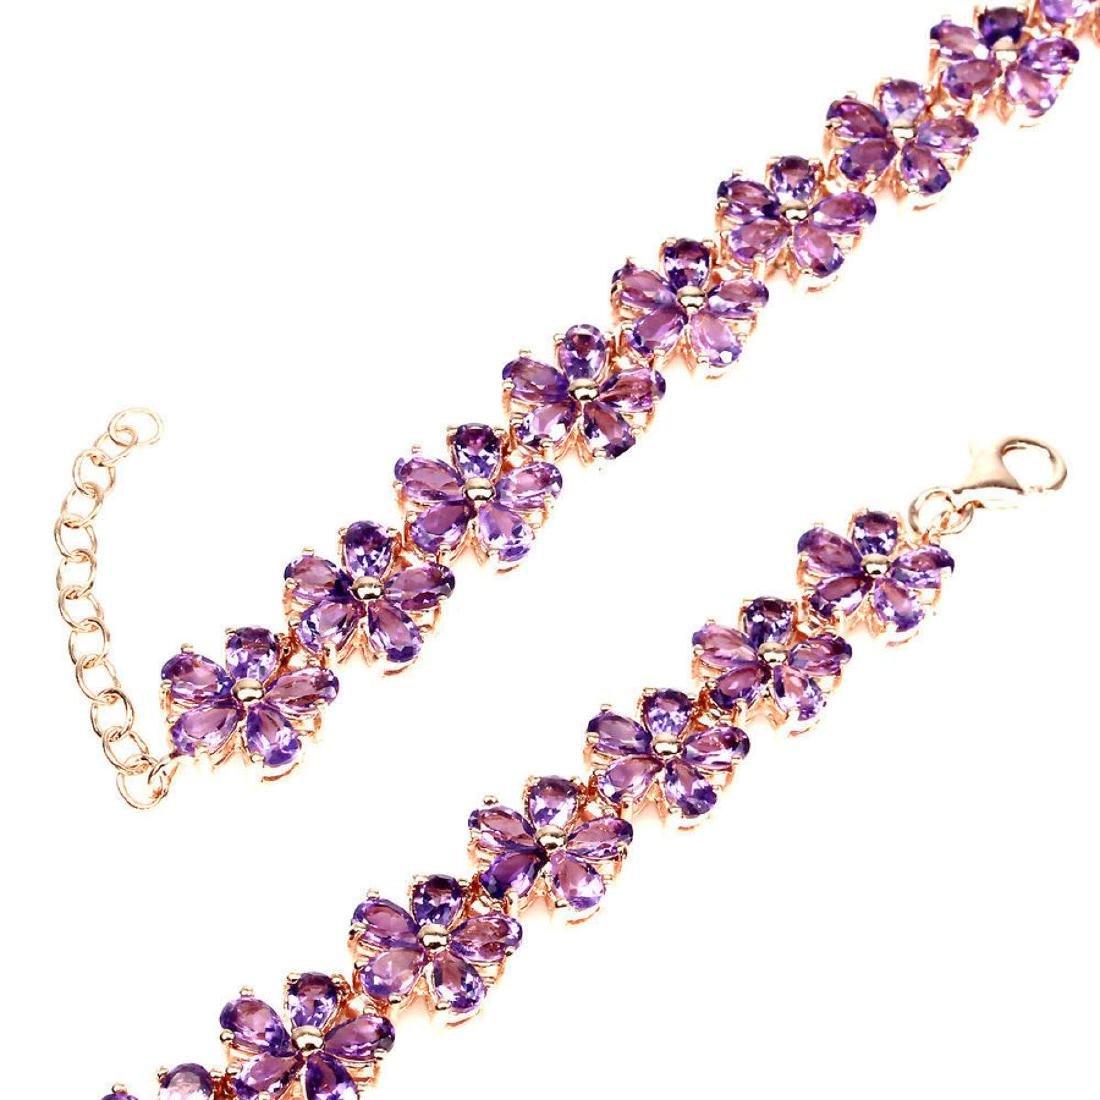 Natural Intense Purple Amethyst Flower 92 Ct Bracelet - 3